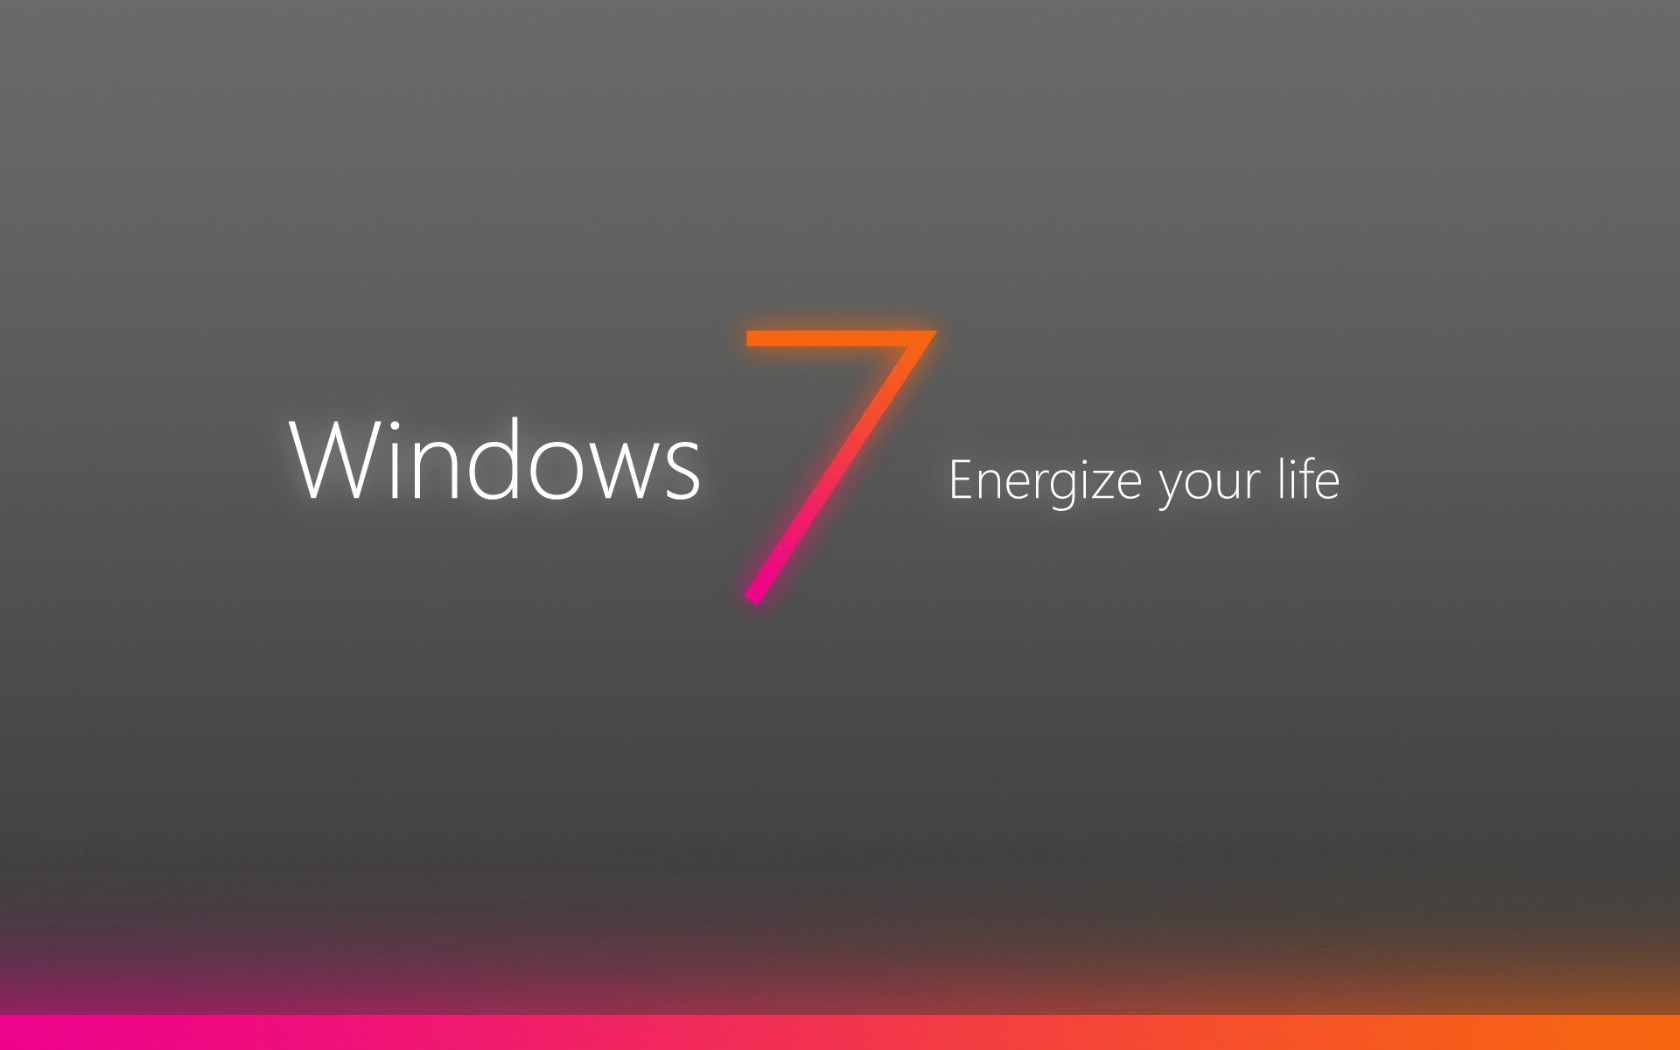 1050windows7梦幻桌面下载壁纸,windows7梦幻桌面下载壁纸图片图片